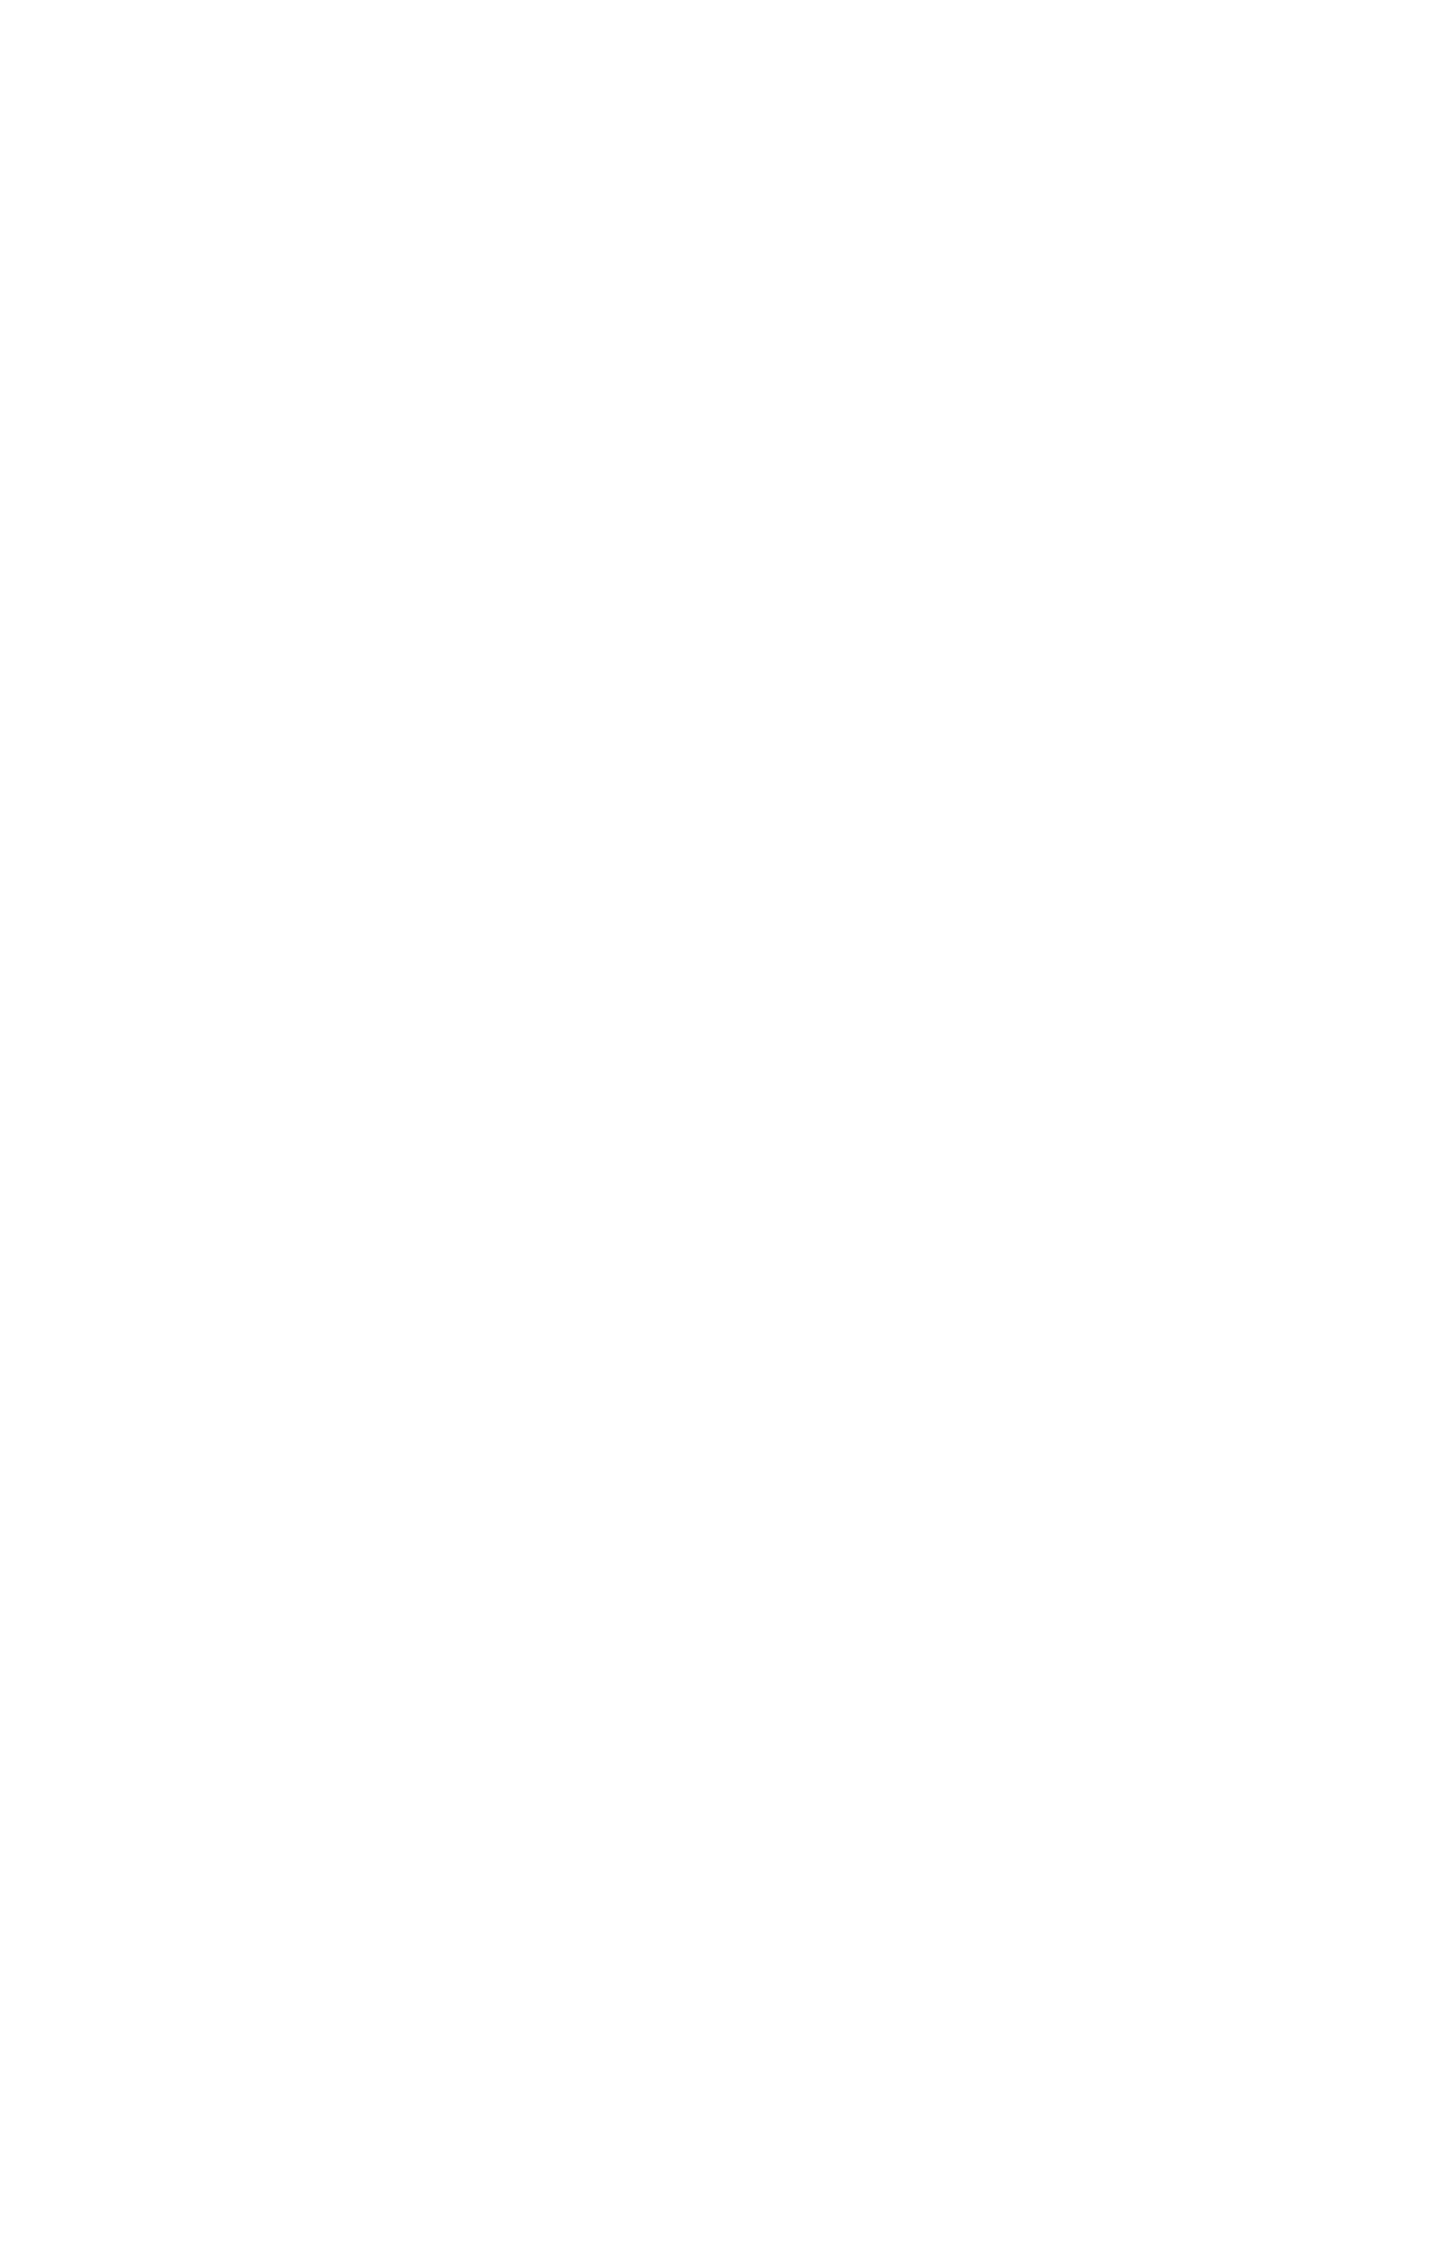 MyPlanetPassLogo.png